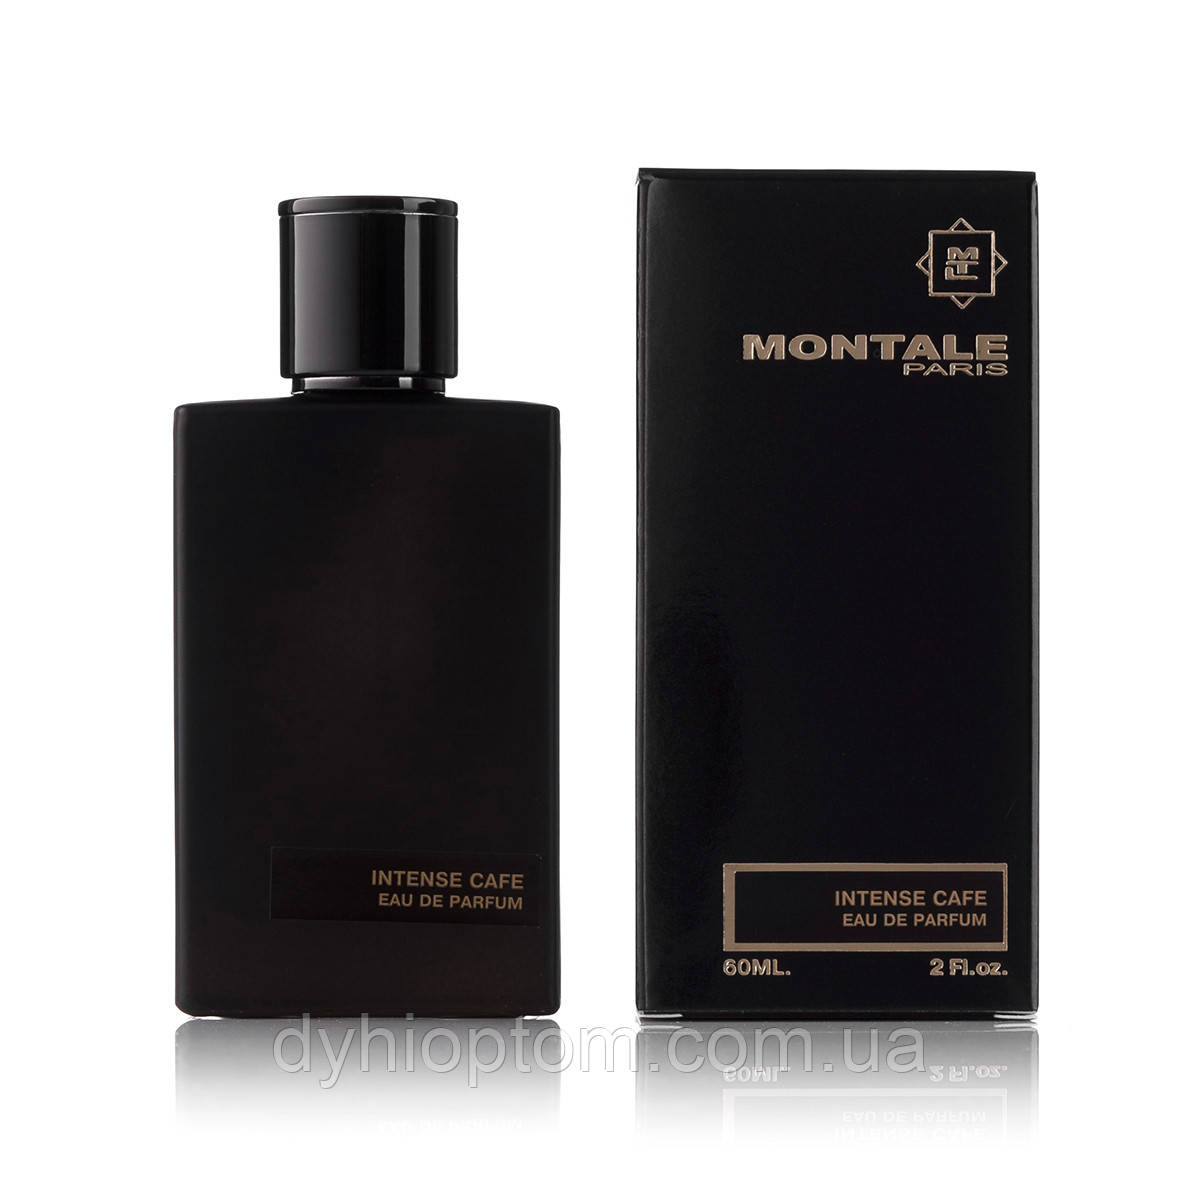 Мини парфюм Montale Intense Cafe 60 мл унисекс